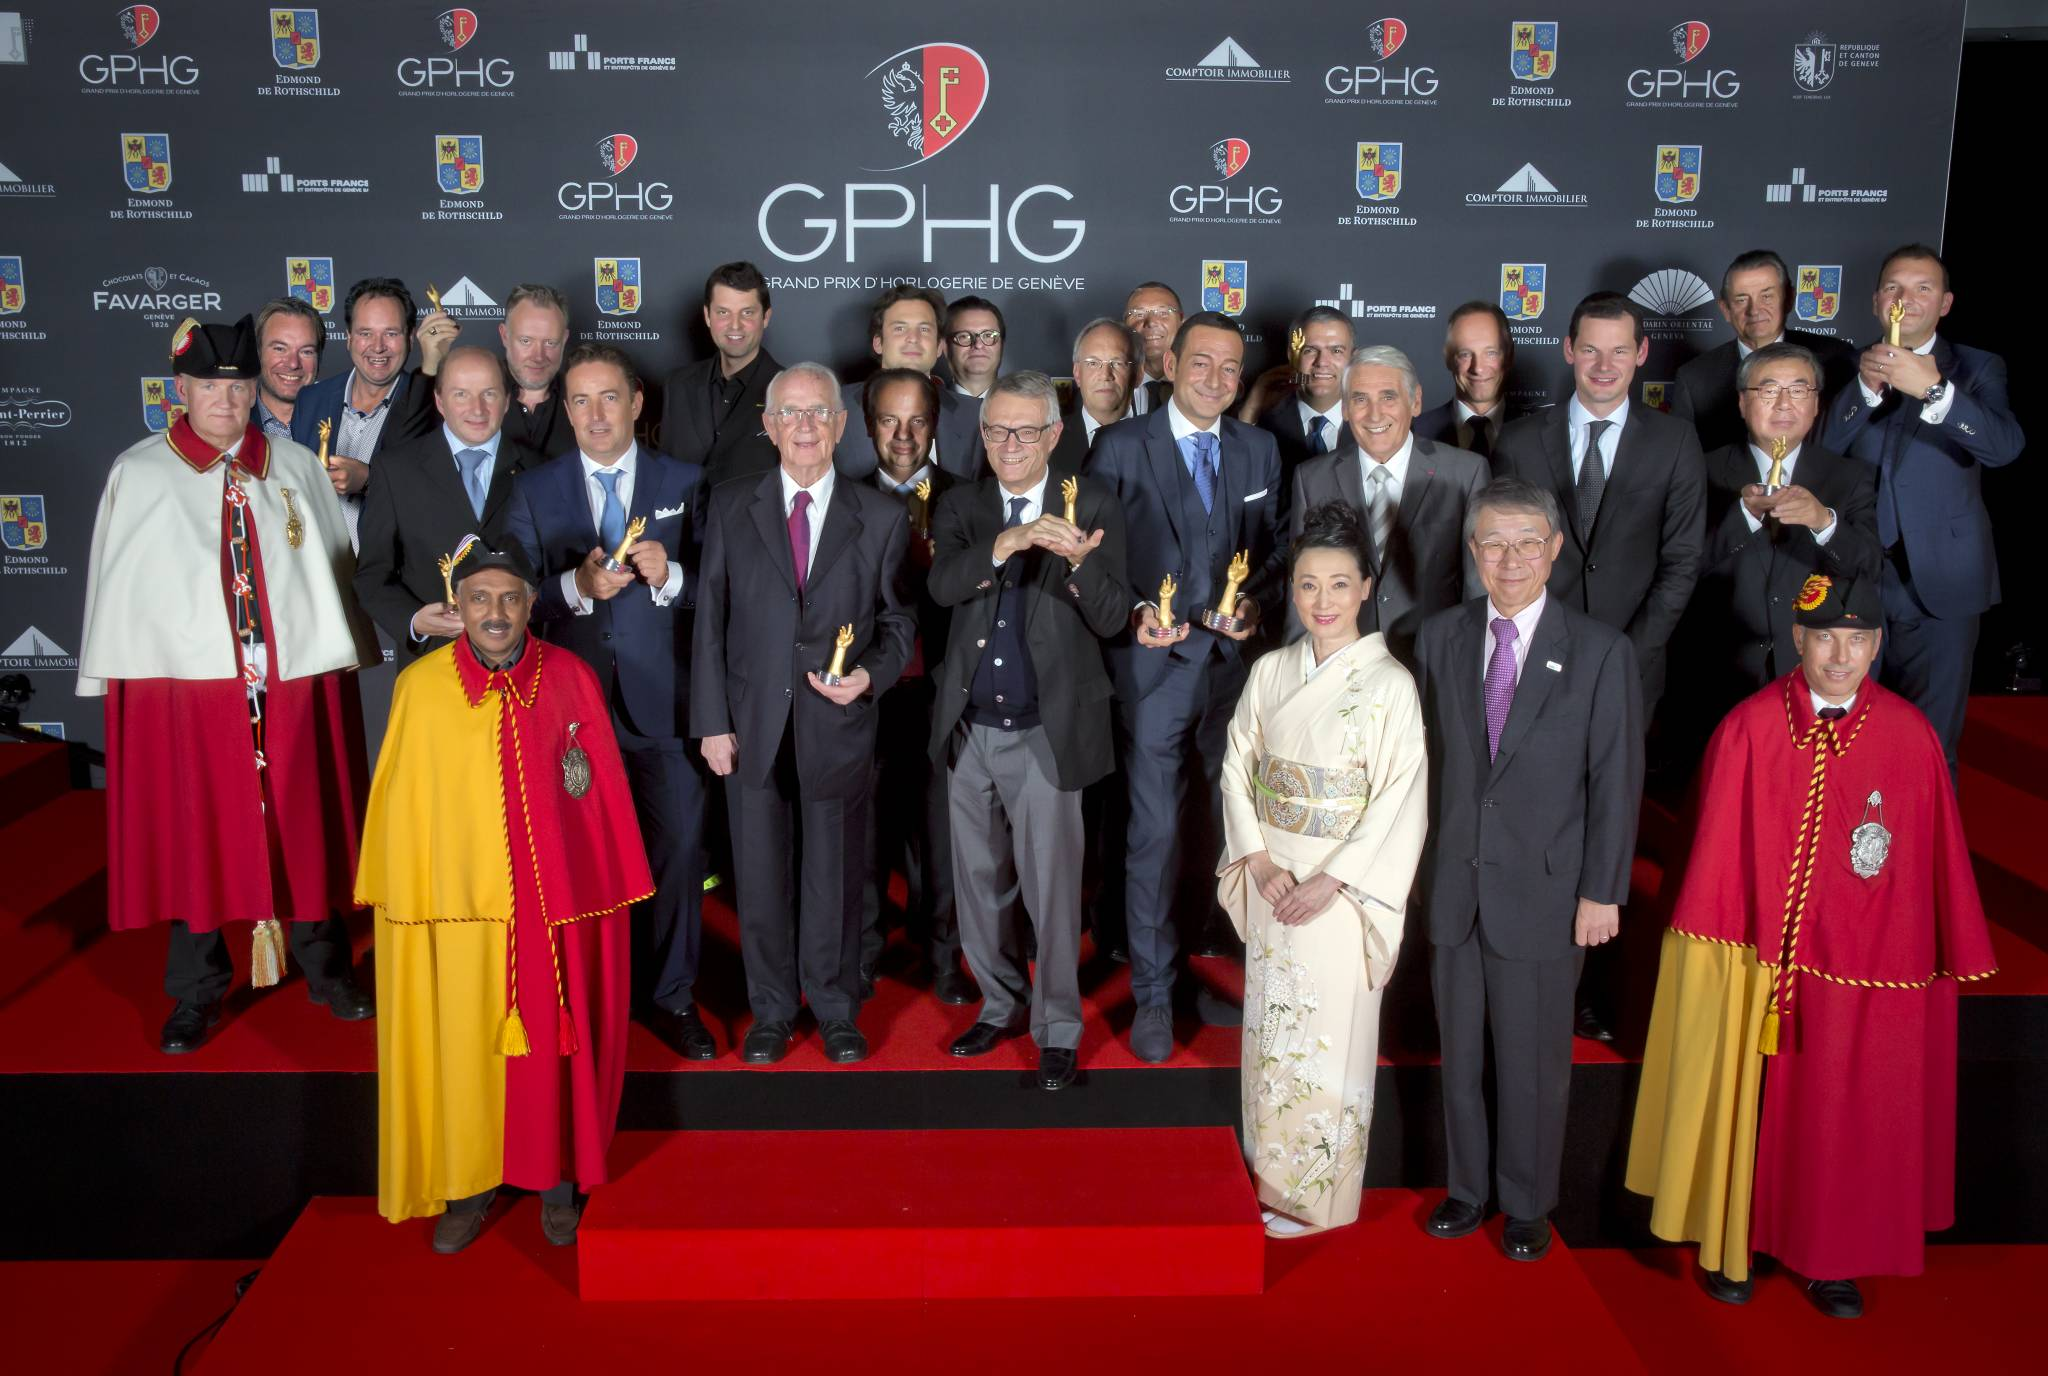 The Prize winners of the Grand Prix d'Horlogerie de Genève 2014 : Bart and Tim Grönefeld (Co-founders of Grönefeld), Kari Voutilainen (Founder of Voutilainen), Felix Baumgartner and Martin Frei (Co-founders of Urwerk), Pierre Jacques (CEO of De Bethune), Walter Lange (Founder of A. Lange & Söhne), Christophe Claret (Founder and president of Christophe Claret), Aldo Magada (President & CEO of Zenith), Dr Helmut Crott (Owner of Urban Jürgensen & Sonner), Johann Schneider-Ammann (Federal Counsellor), Jean-Christophe Babin (CEO of Bulgari), Jean-Charles Zufferey (Vice-president of Breguet), Ricardo Guadalupe (CEO of Hublot), Carlo Lamprecht (President of the Fondation of GPHG), Ryuhei Maeda (His Excellency Ambassador of Japan to in Switzerland) et Naoko Maeda, Wilhelm Schmid (CEO of A. Lange & Söhne), Pierre Maudet (State Councillor in Geneva), Stephen Urquhart (CEO of Omega), Susumu Kawanishi (Senior Vice-président of Seiko), Vincent Becchia (Product Director of Blancpain)